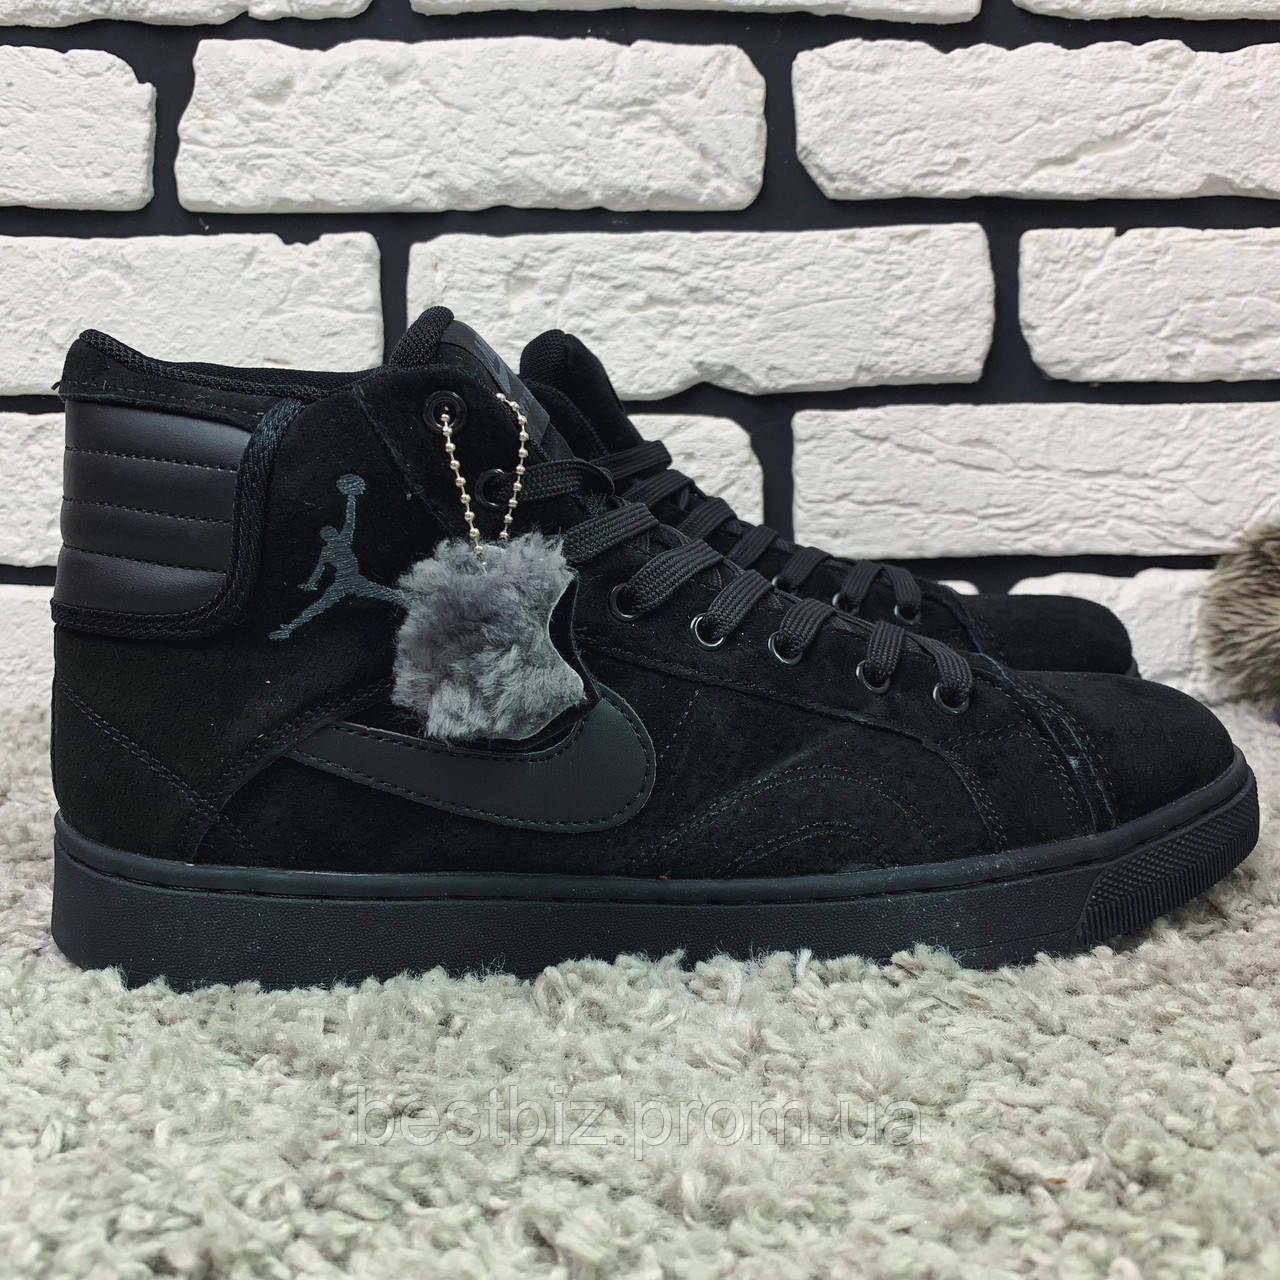 Зимові кросівки (на хутрі) Nike Air sky high 1-166 ⏩ [44,45 ]